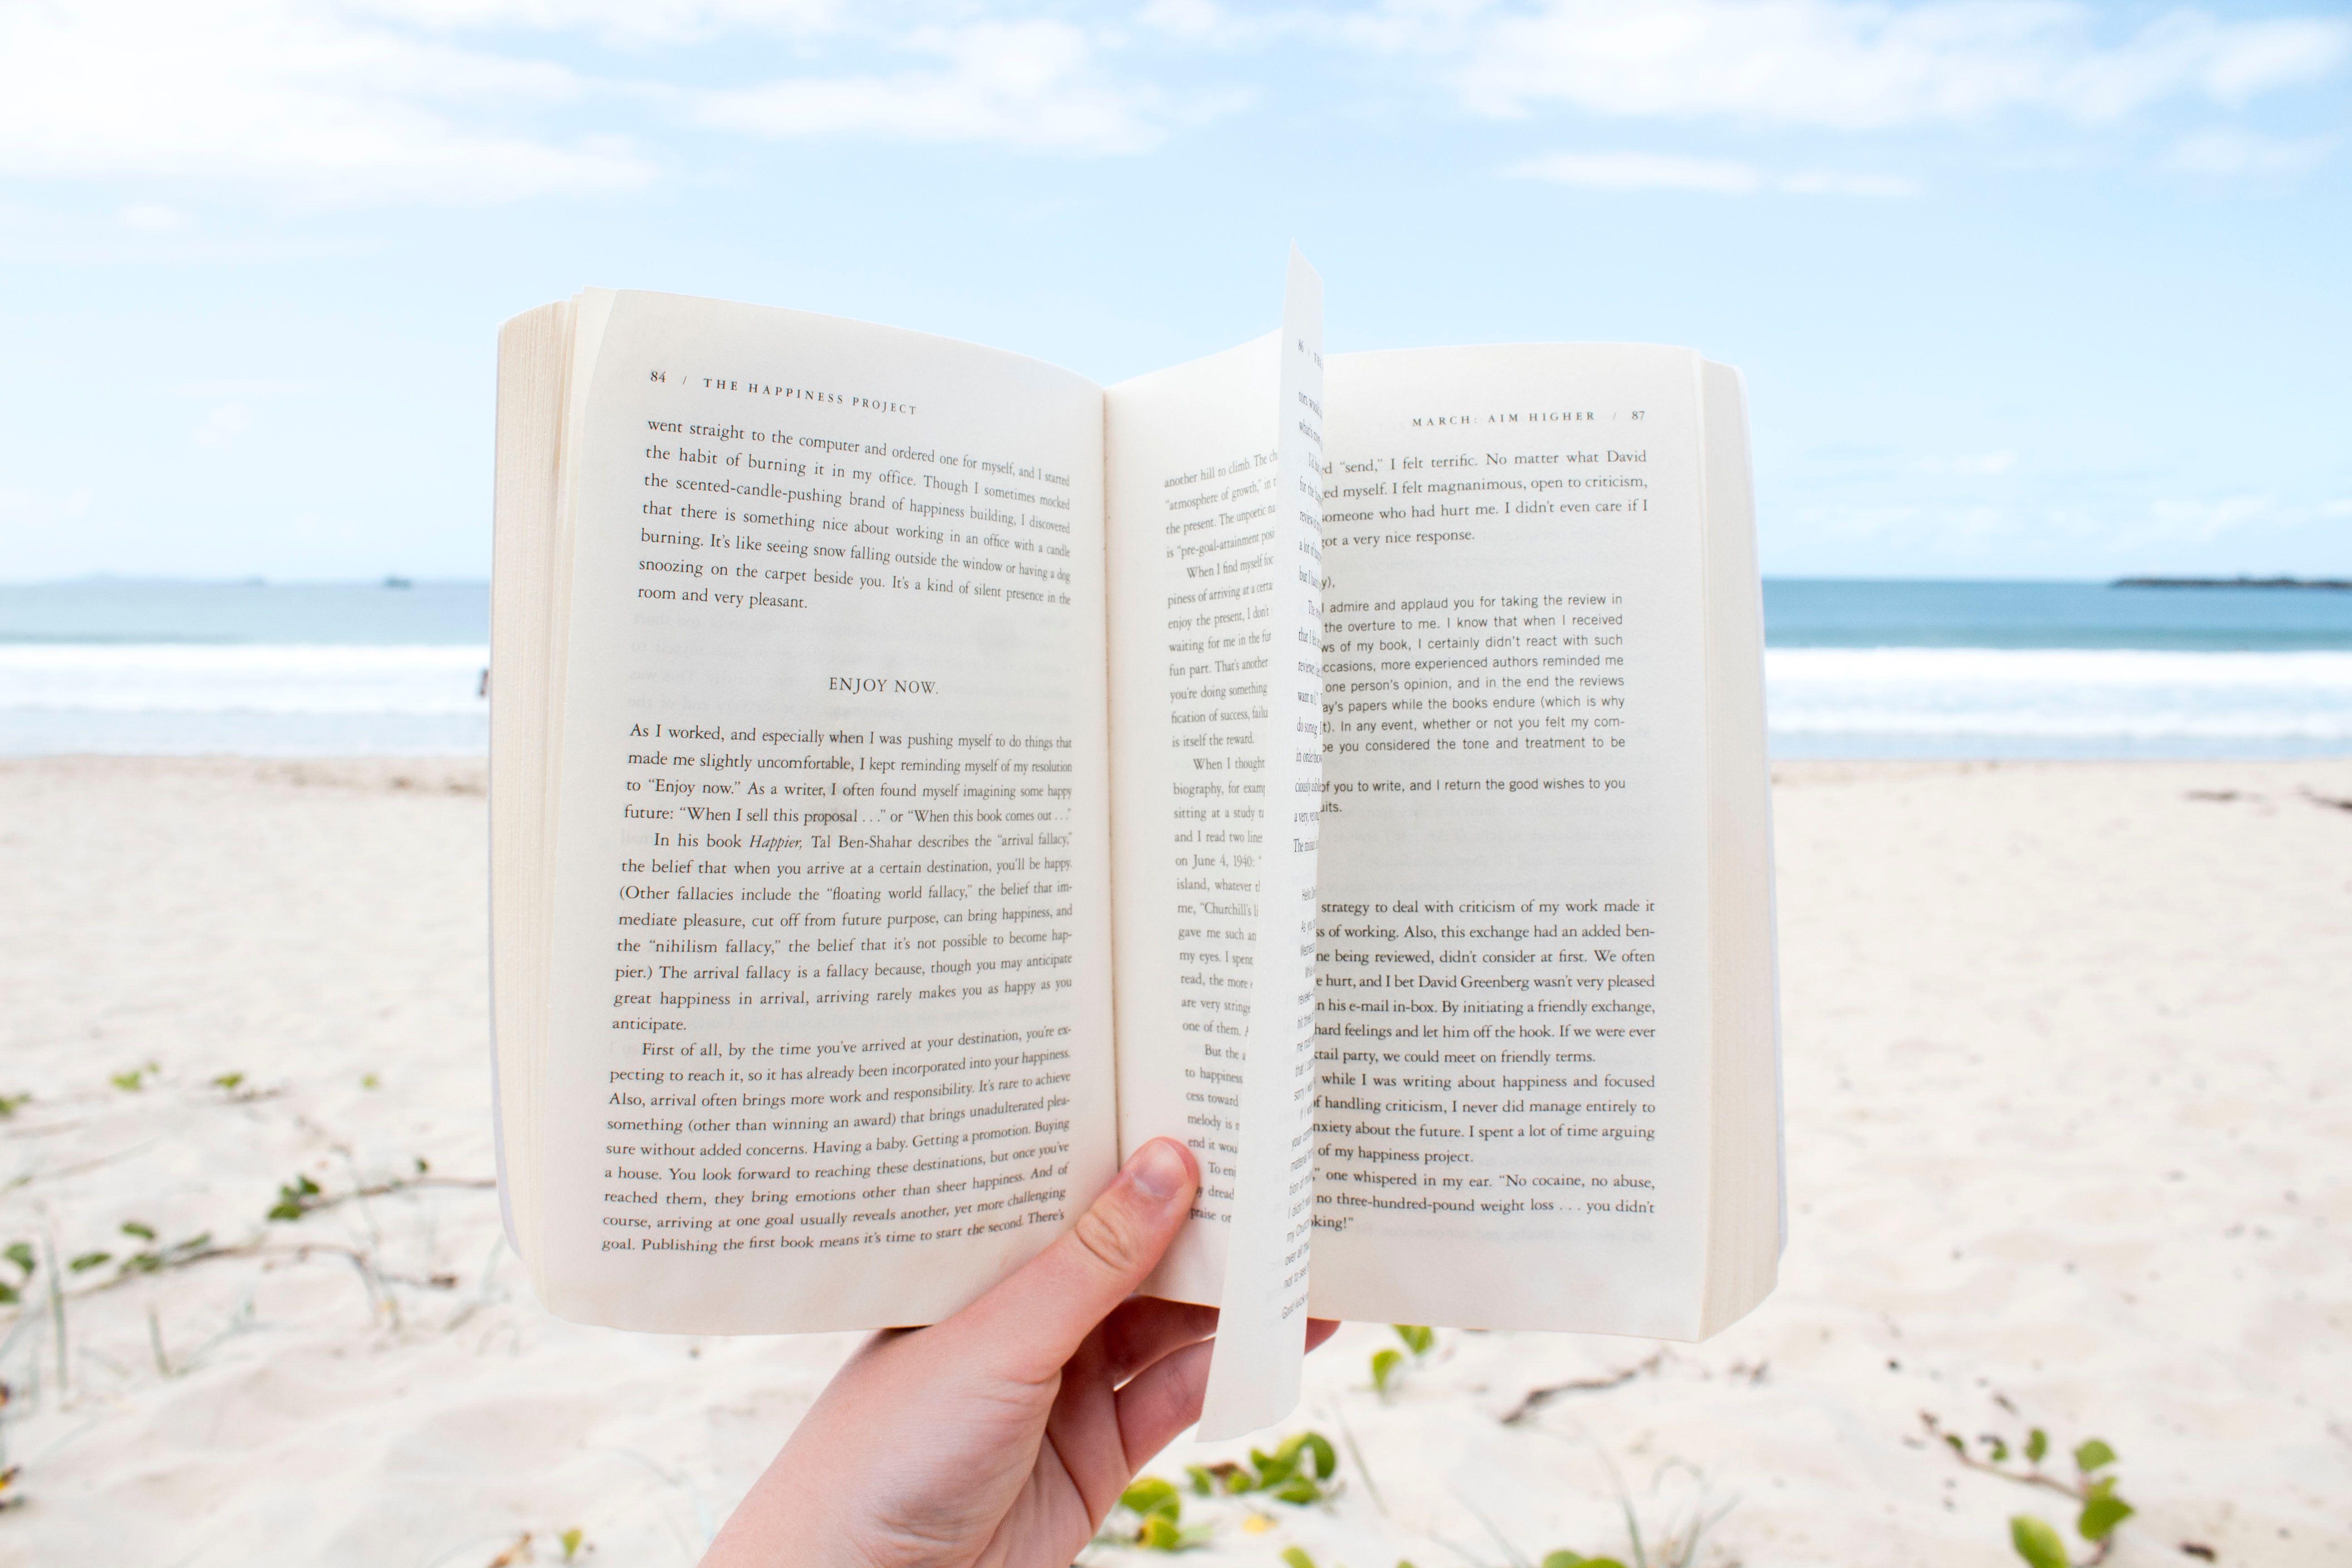 Summer reading? Super rewards!